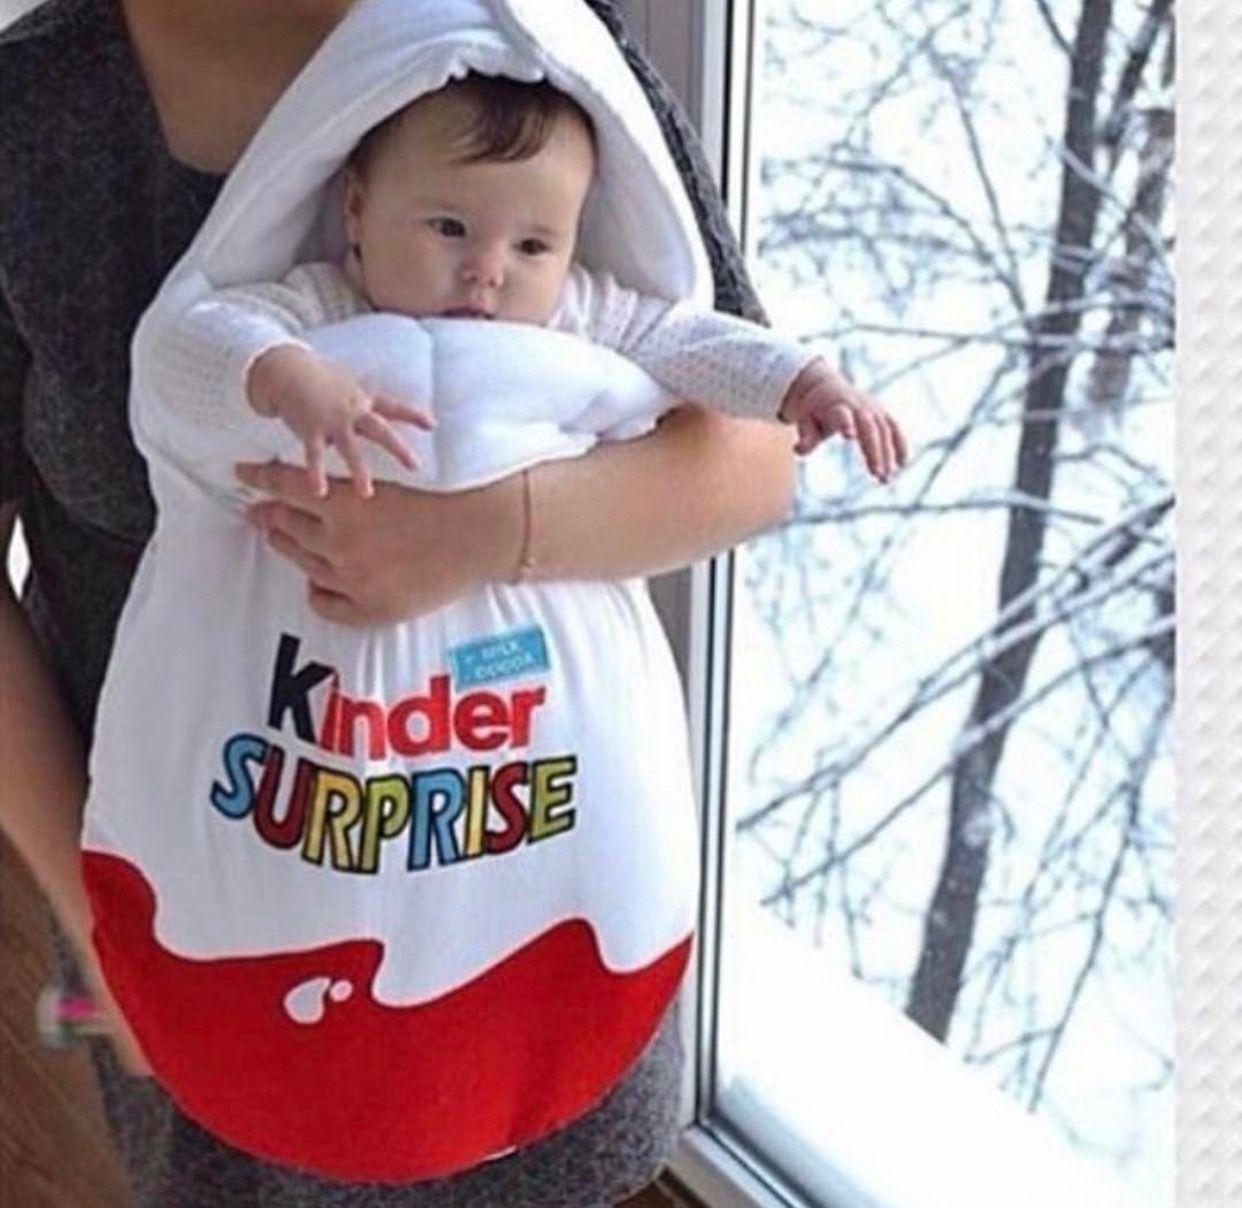 Kinder Surprise Baby